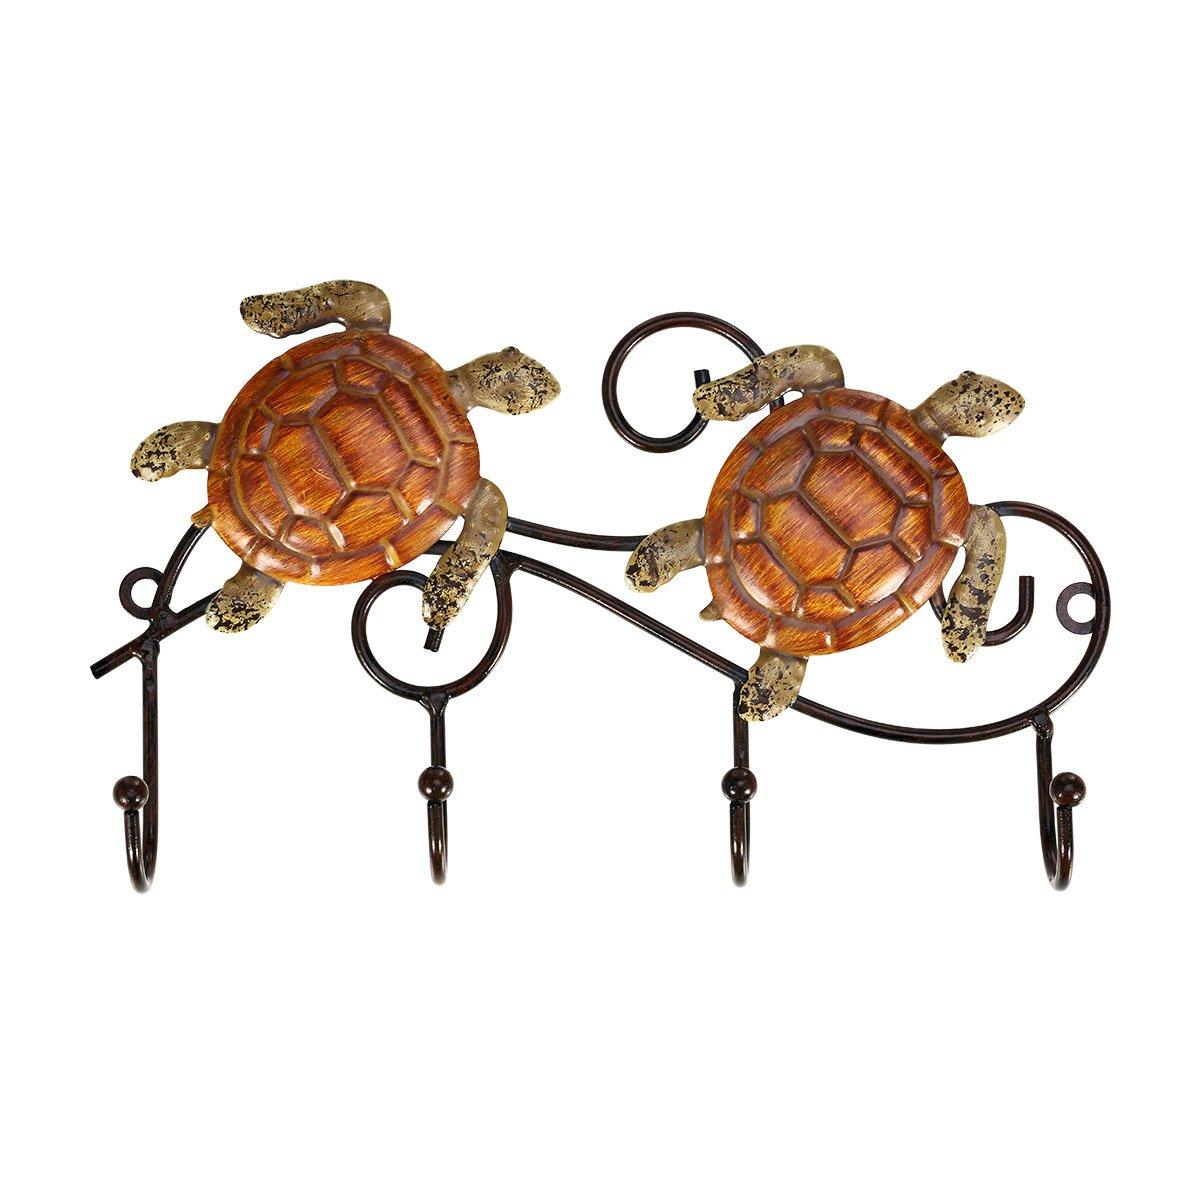 Tooarts Rustic Iron Wall Mounted Key Rack Holder Vintage Design with 4 Hooks Coats Keys Bags Hanger Wall Mounted Decorative Gift Idea